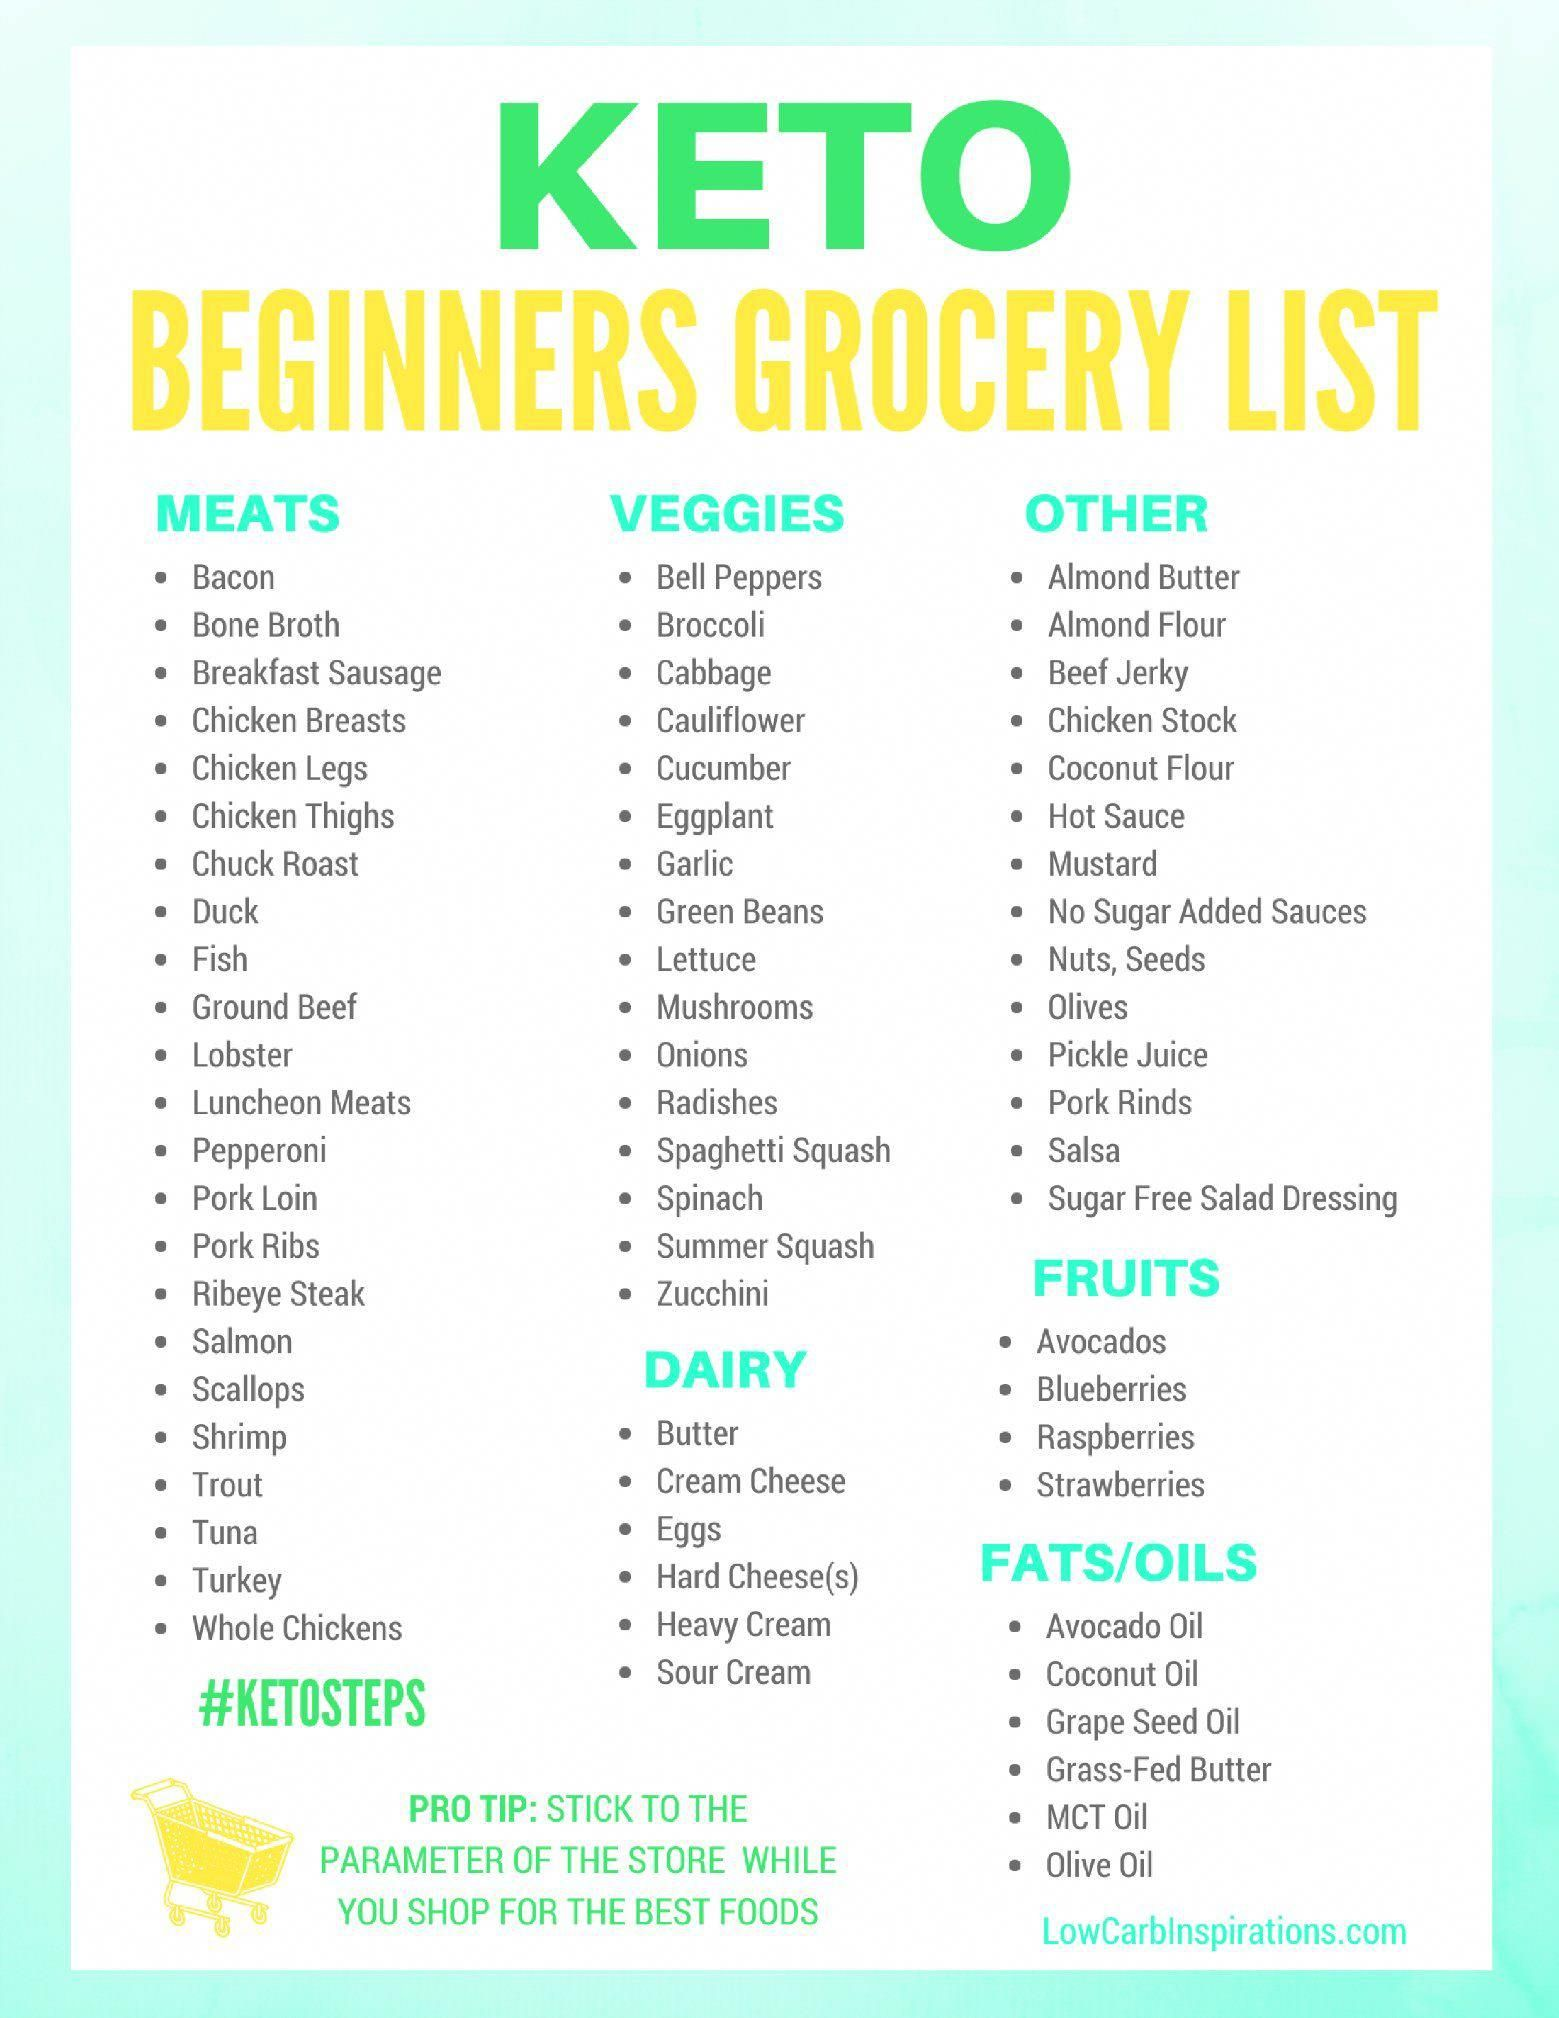 Keto Grocery List for Beginners via @isavea2z #healthygrocerylist #ketorecipesforbeginners